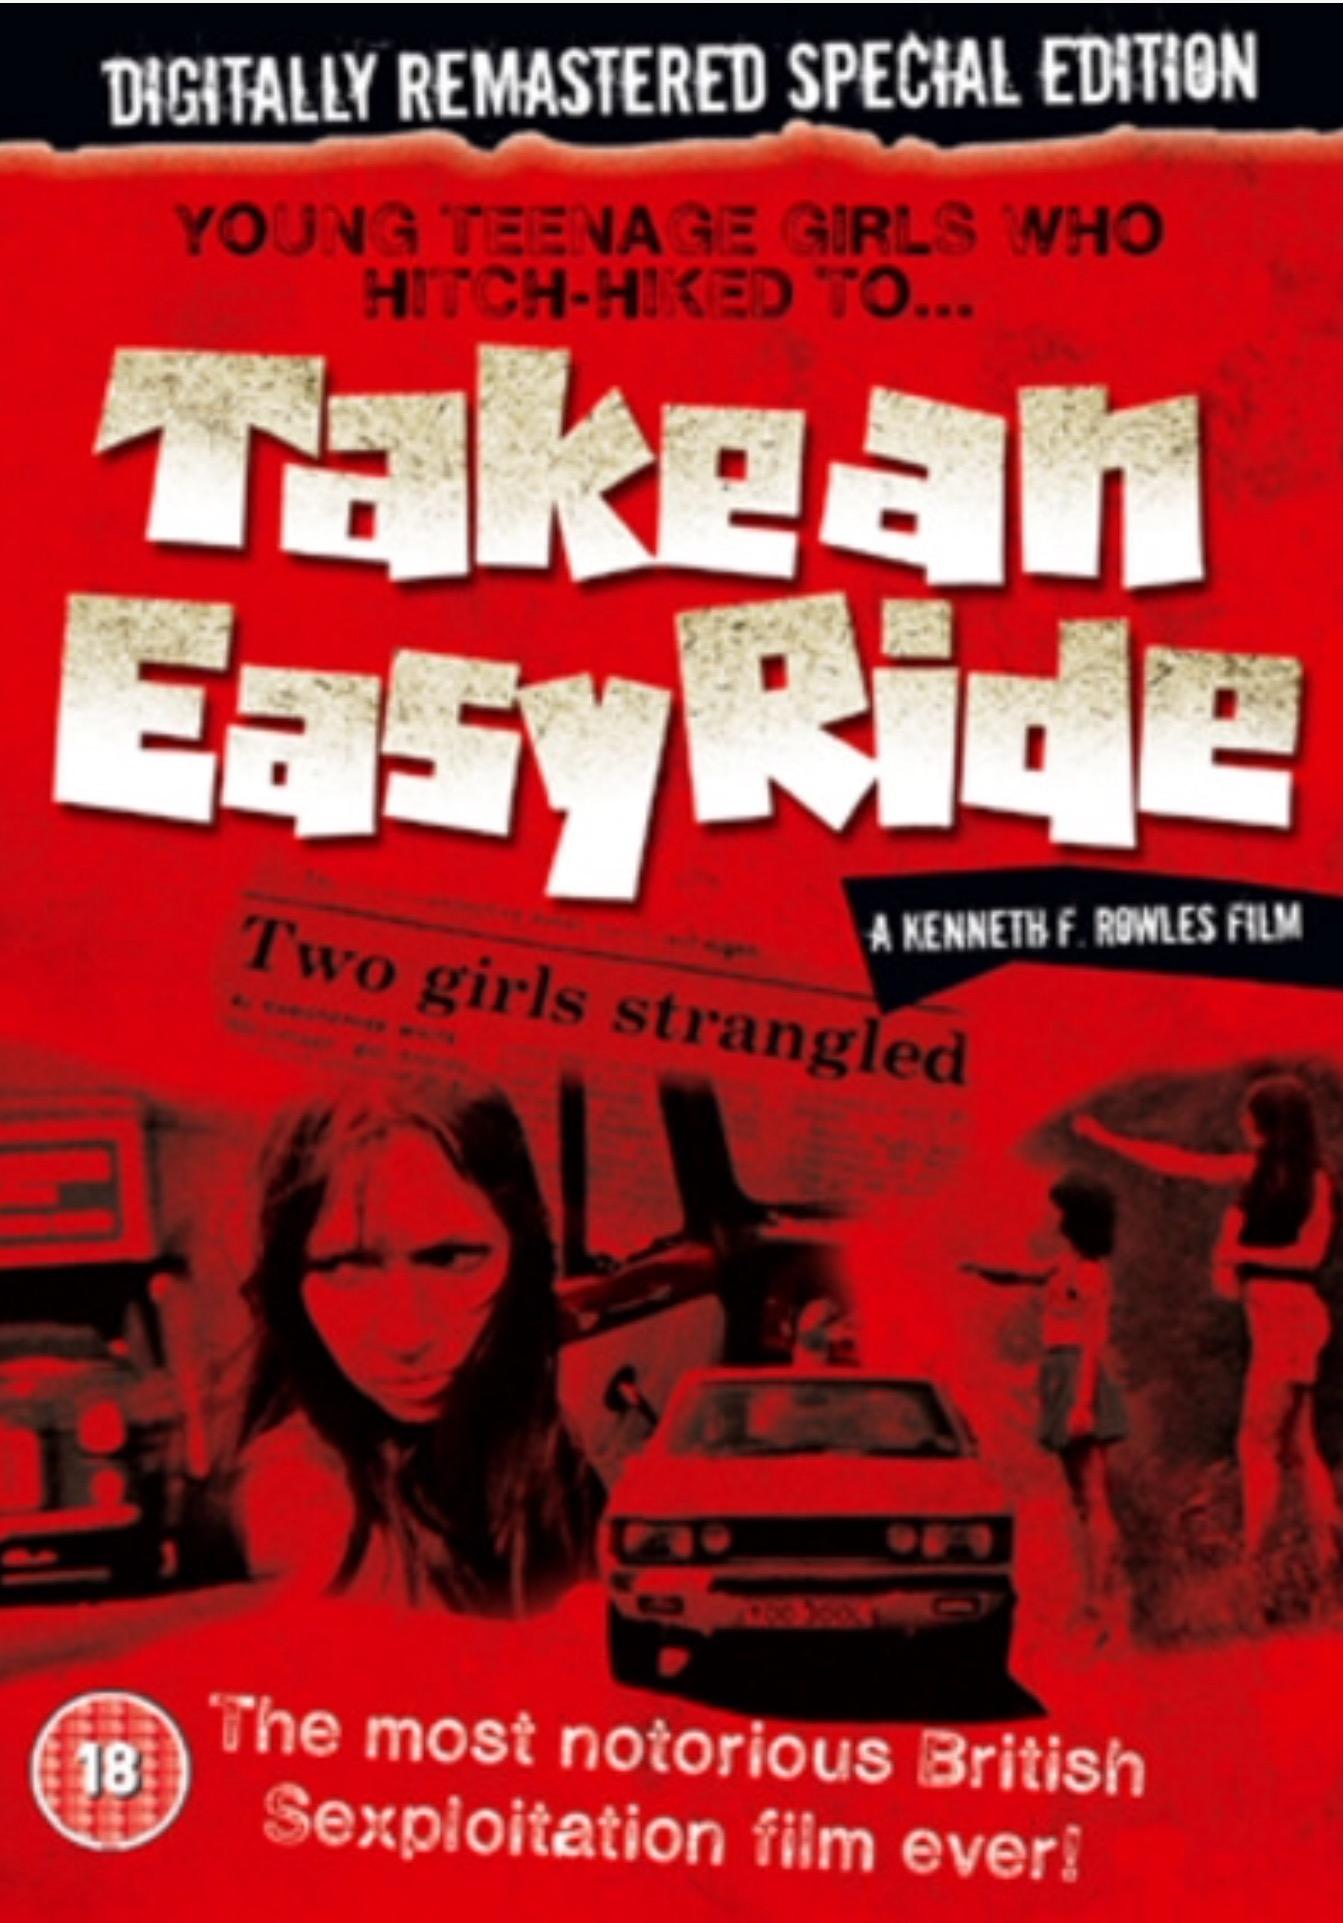 Take an Easy Ride (1976)